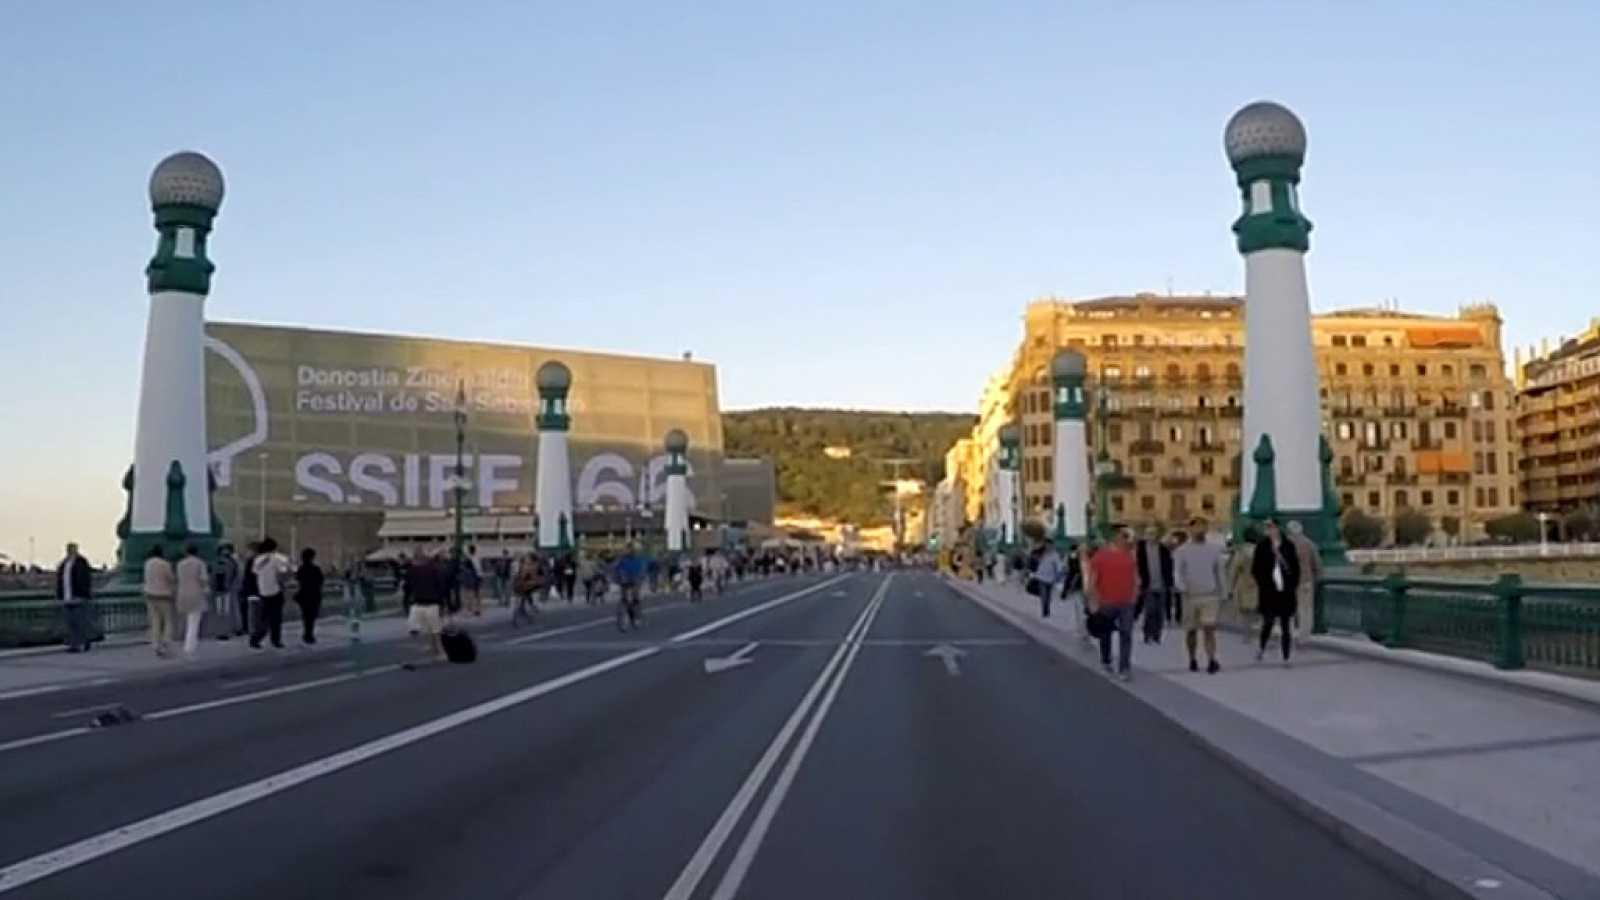 Festival De Cine De San Sebastián 2018 Making Off Rtvees